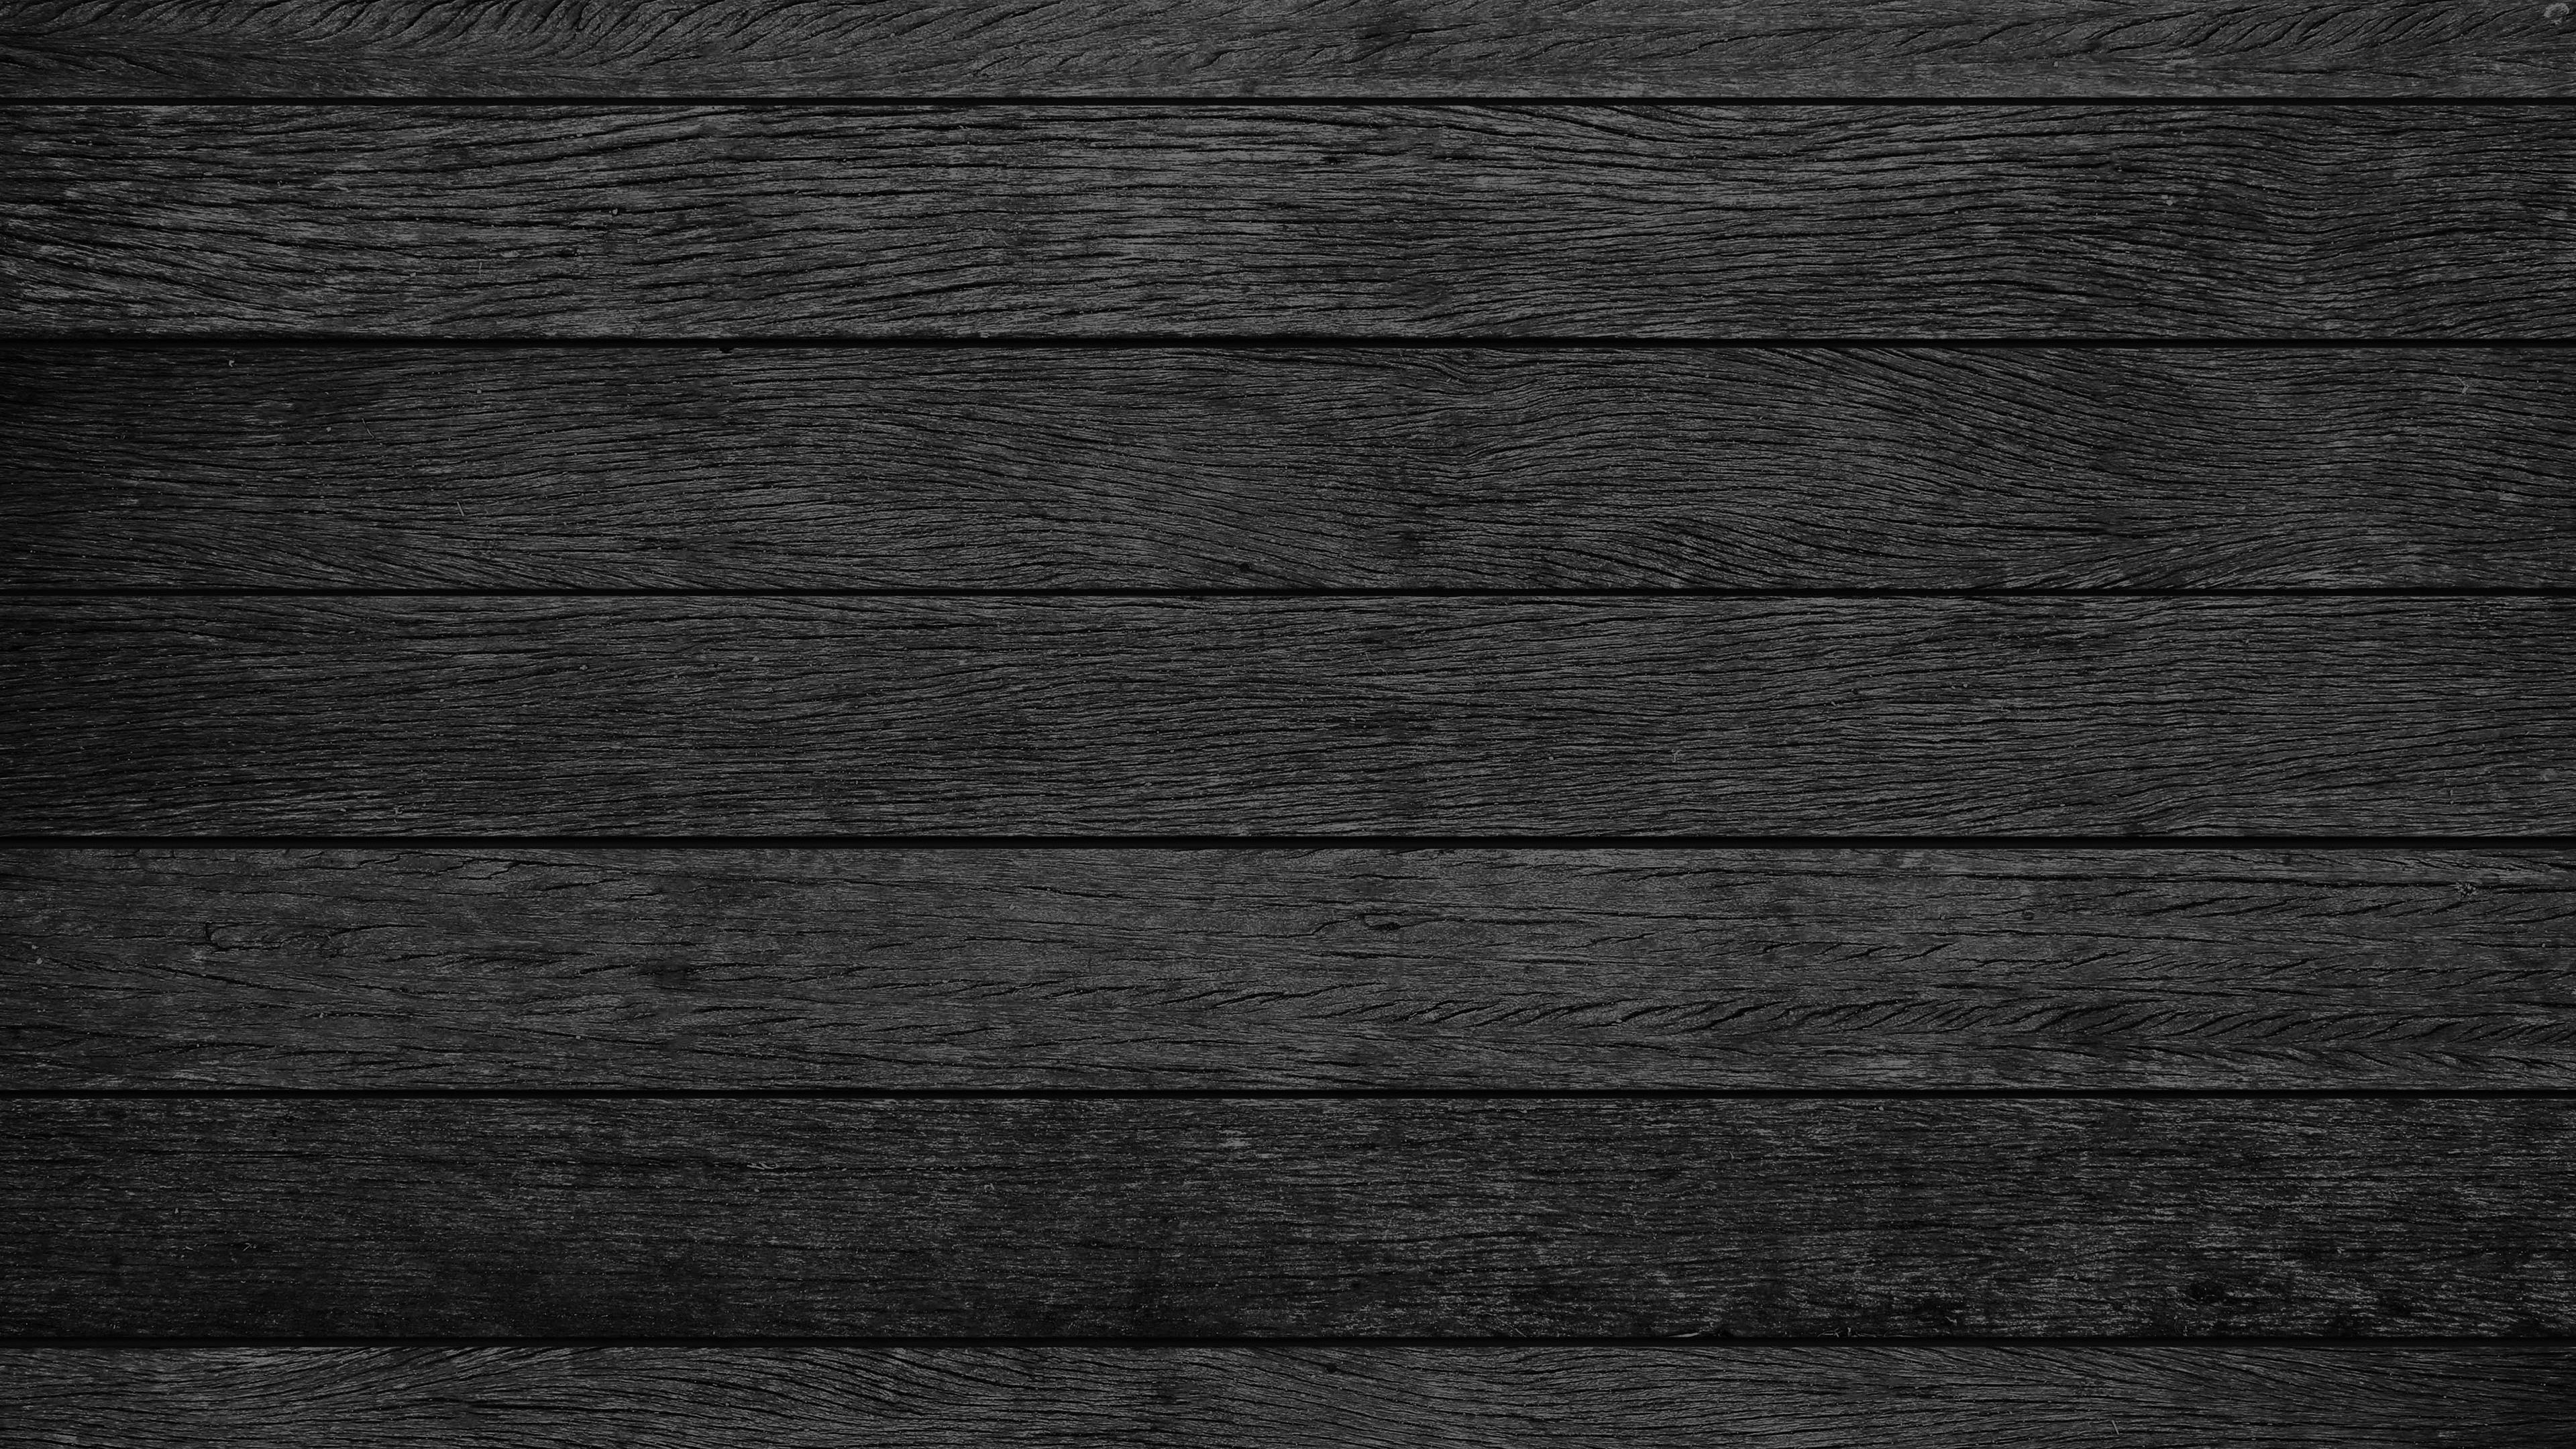 Wallpaper 4k Abstract Dark Wood